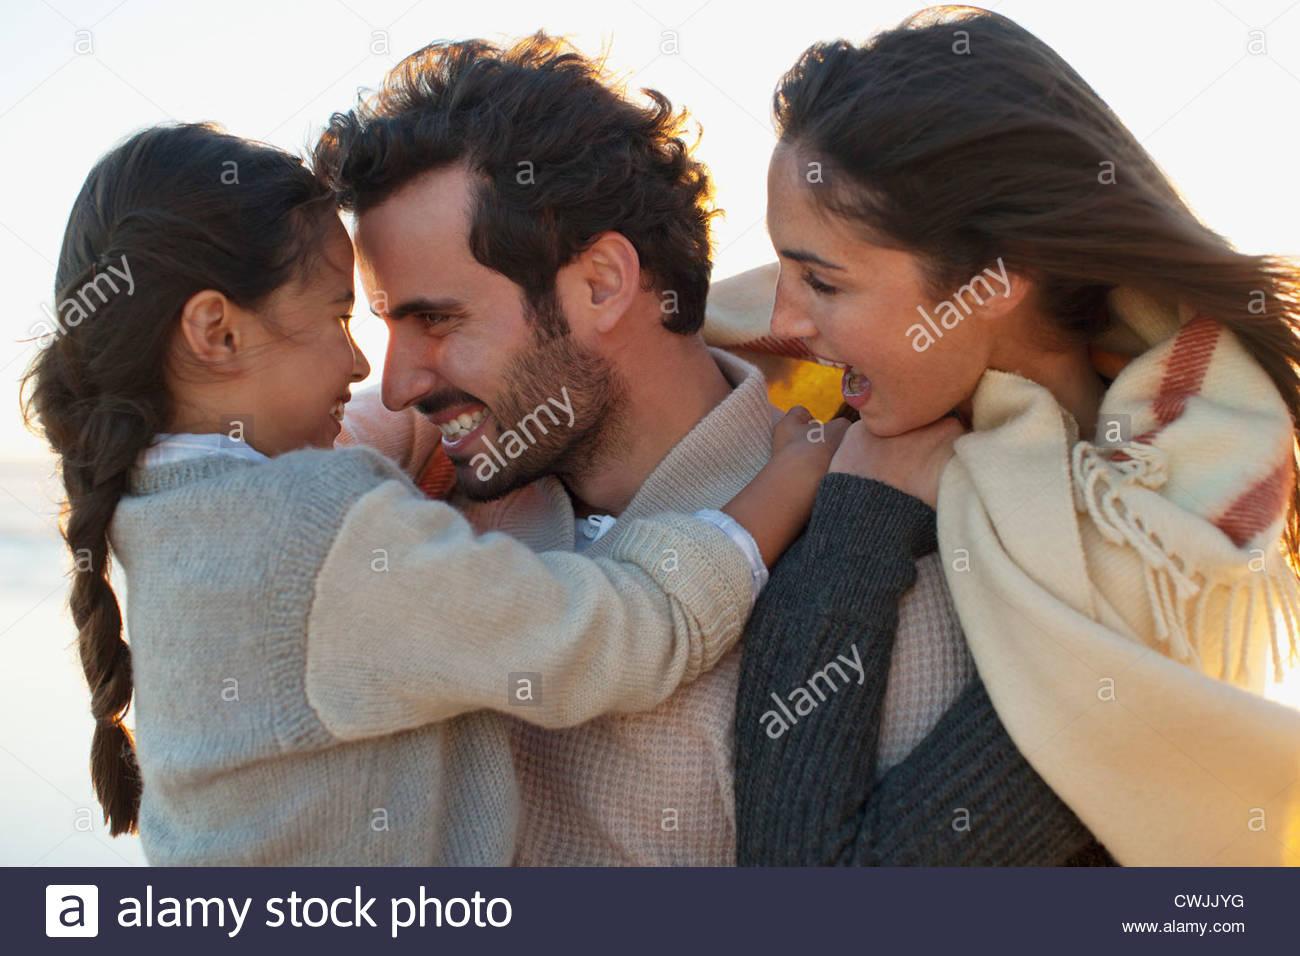 Smiling family hugging - Stock Image